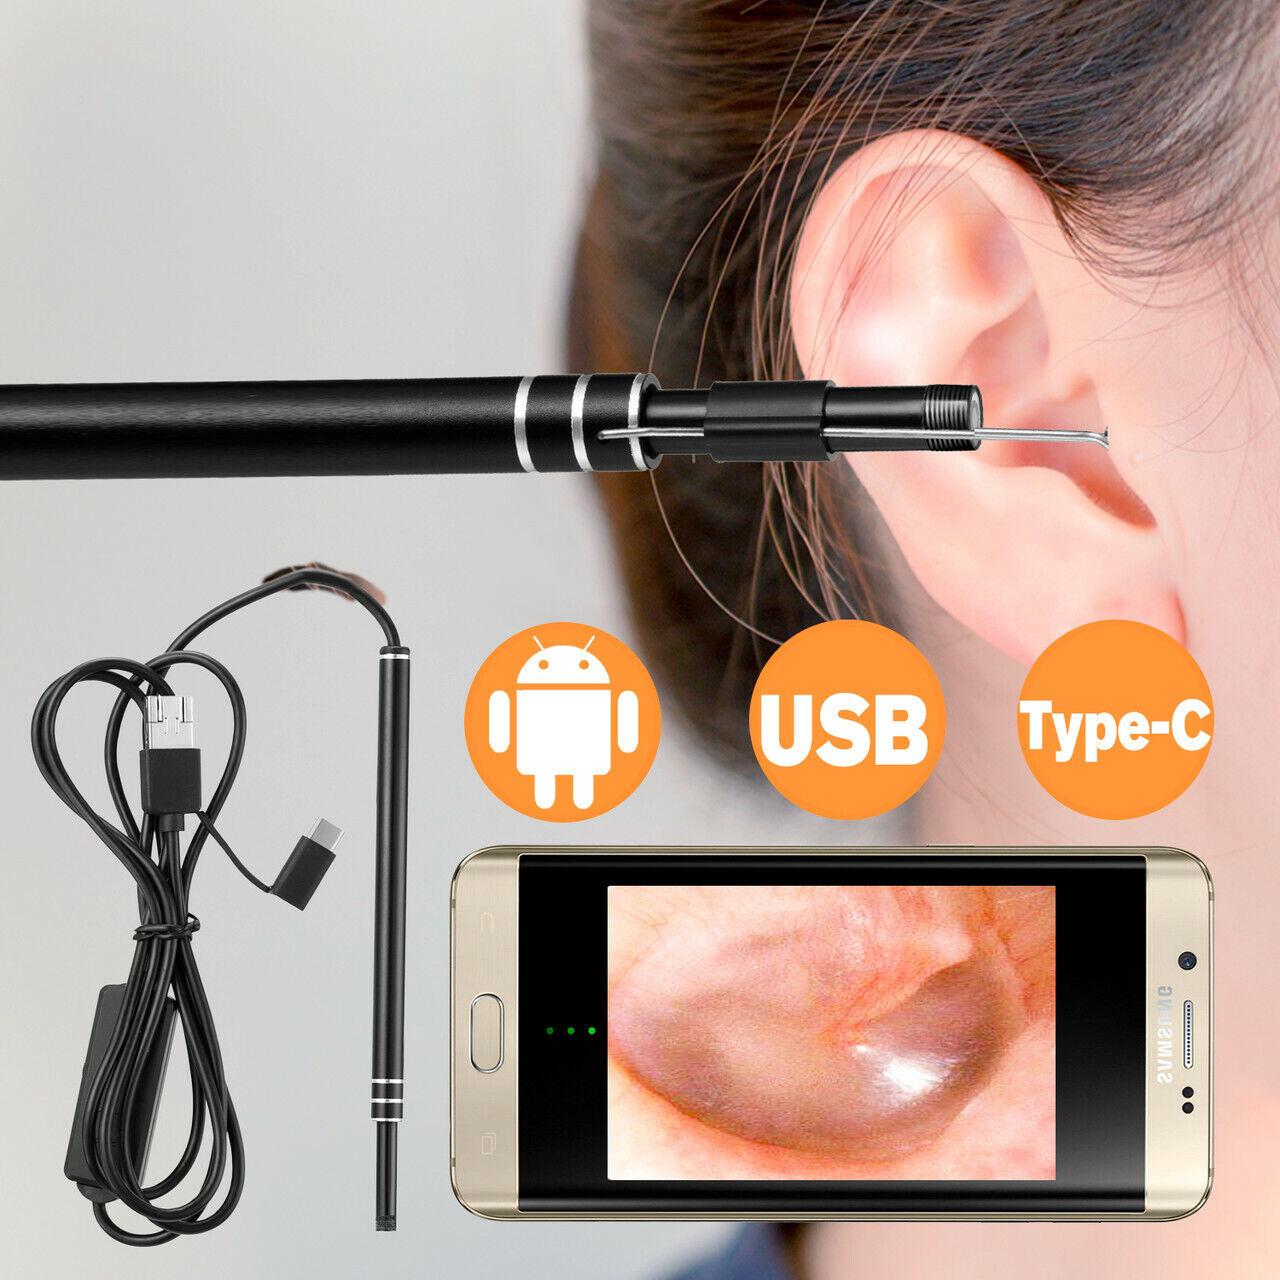 Led Endoscope Otoscope Ear Camera Scope Earwax Removal Kit E